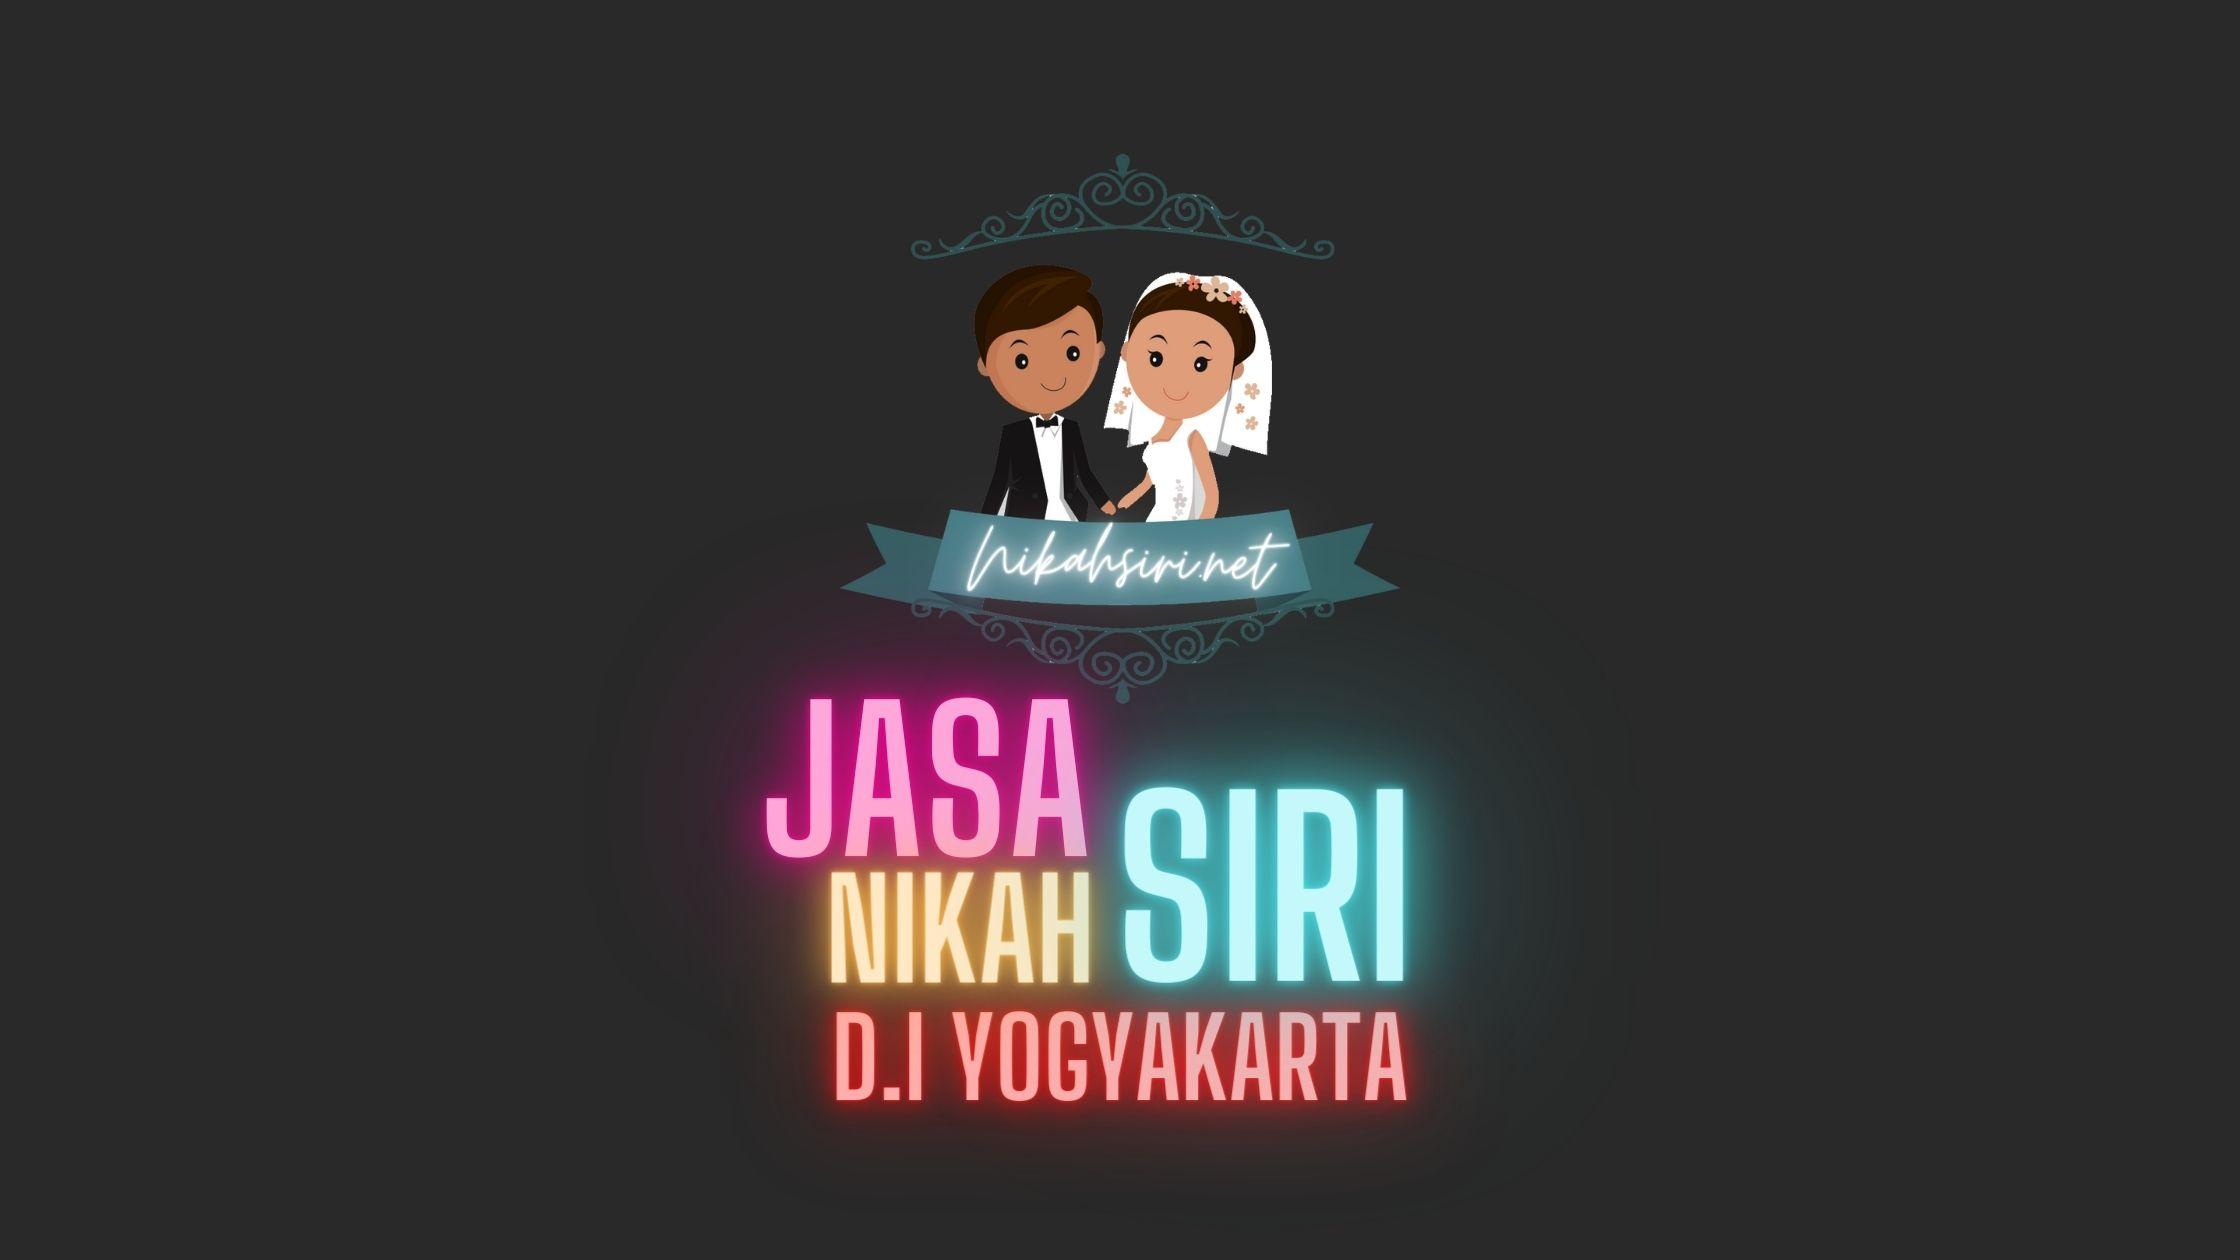 Jasa Nikah Siri Jogja, Bantul, Sleman, Kulon Progo, Gunung Kidul